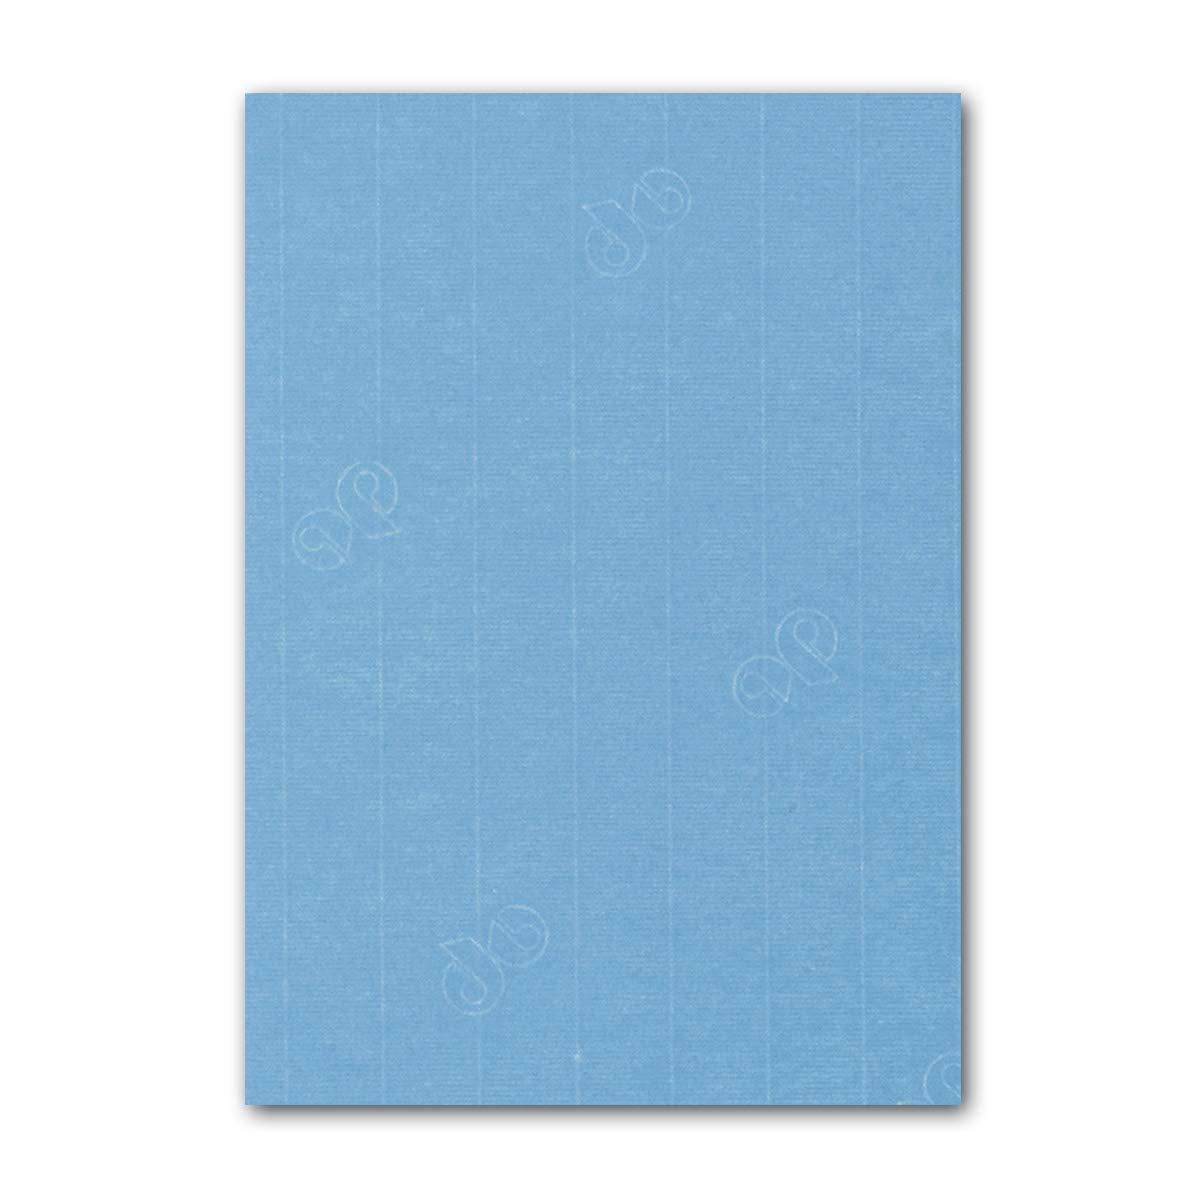 ARTOZ 150x Briefpapier + Bastelpapier Bastelkarton - Taupe - DIN A4 297 x 210 mm – Edle Egoutteur-Rippung – Hochwertiges 220 g m² Tonpapier – Scrapbooking Papier 415 - Marienblau 100 Stück